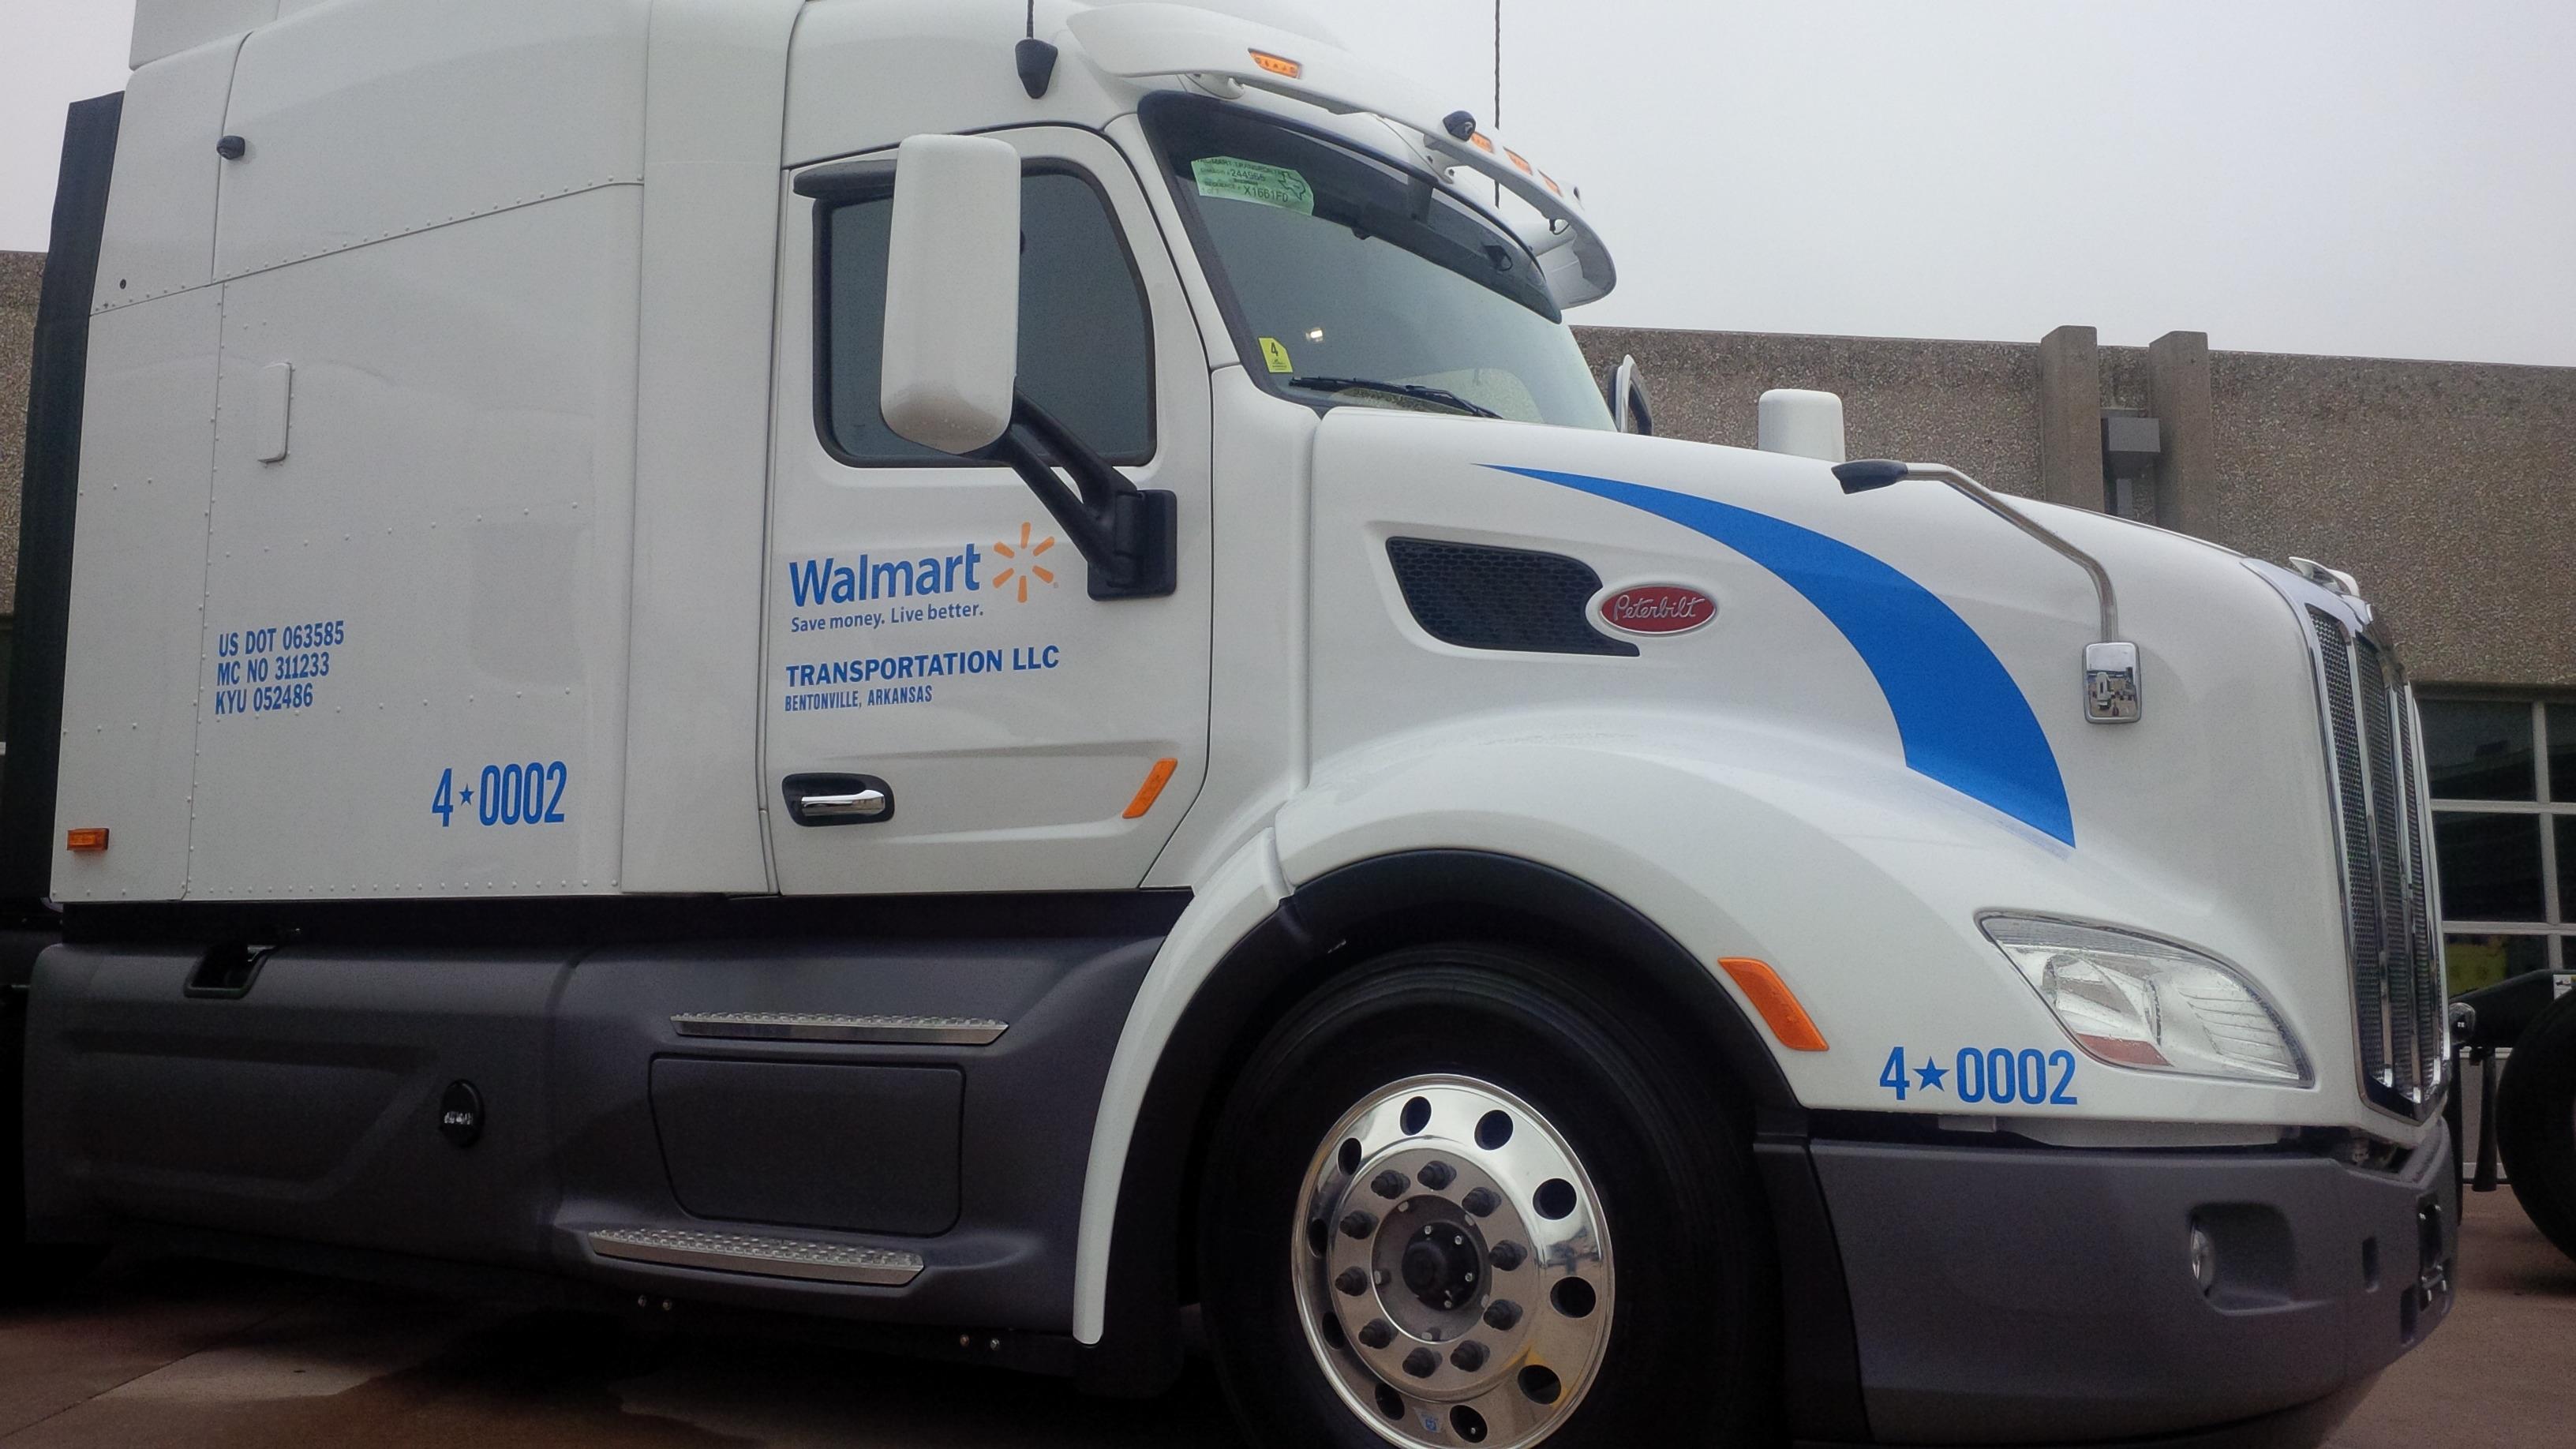 Peterbilt showcases latest technologies - Truck News